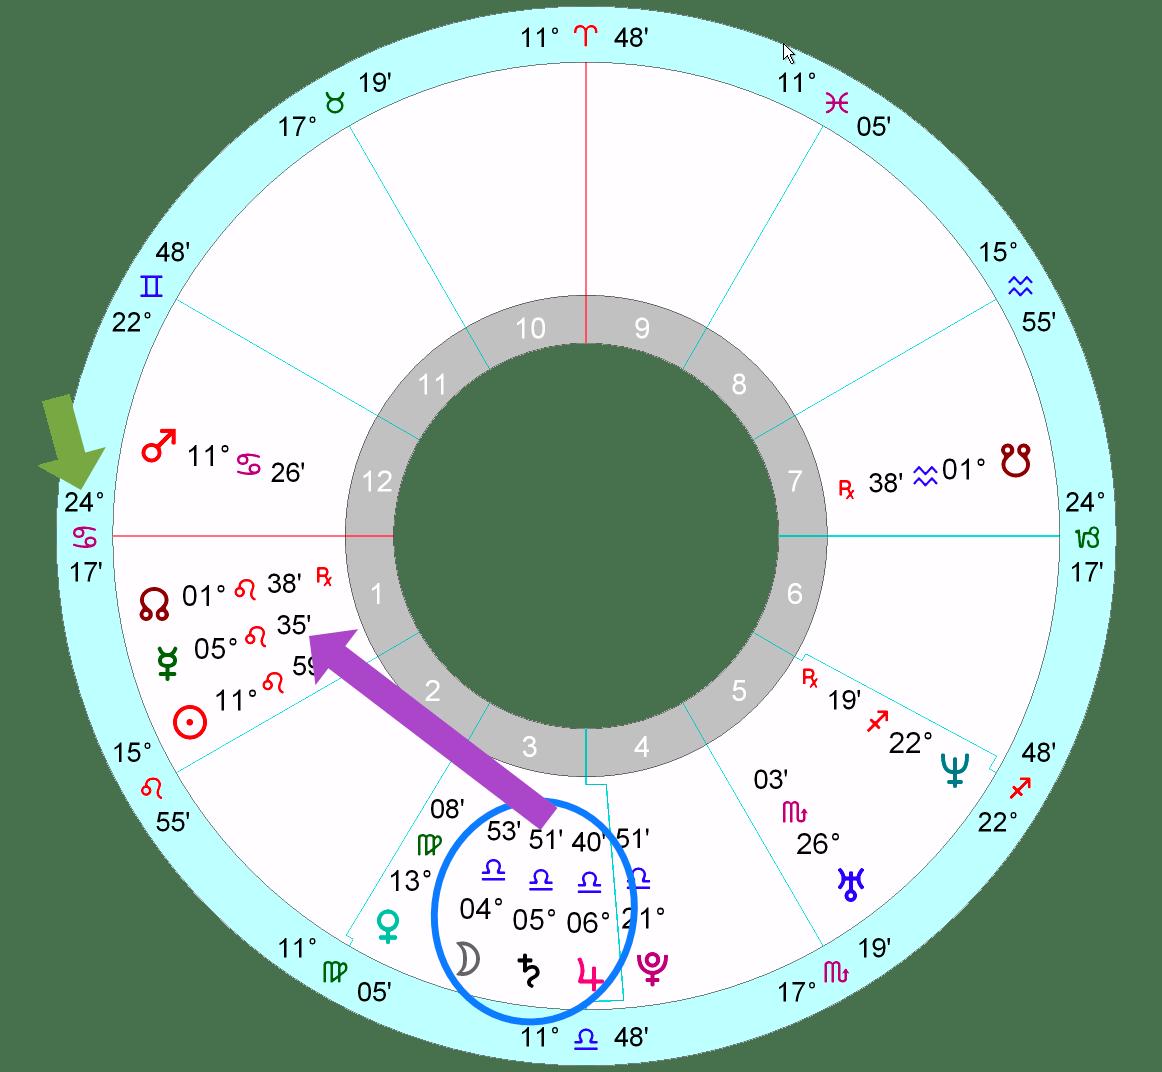 Meghan Markle's horoscope | Astrology School